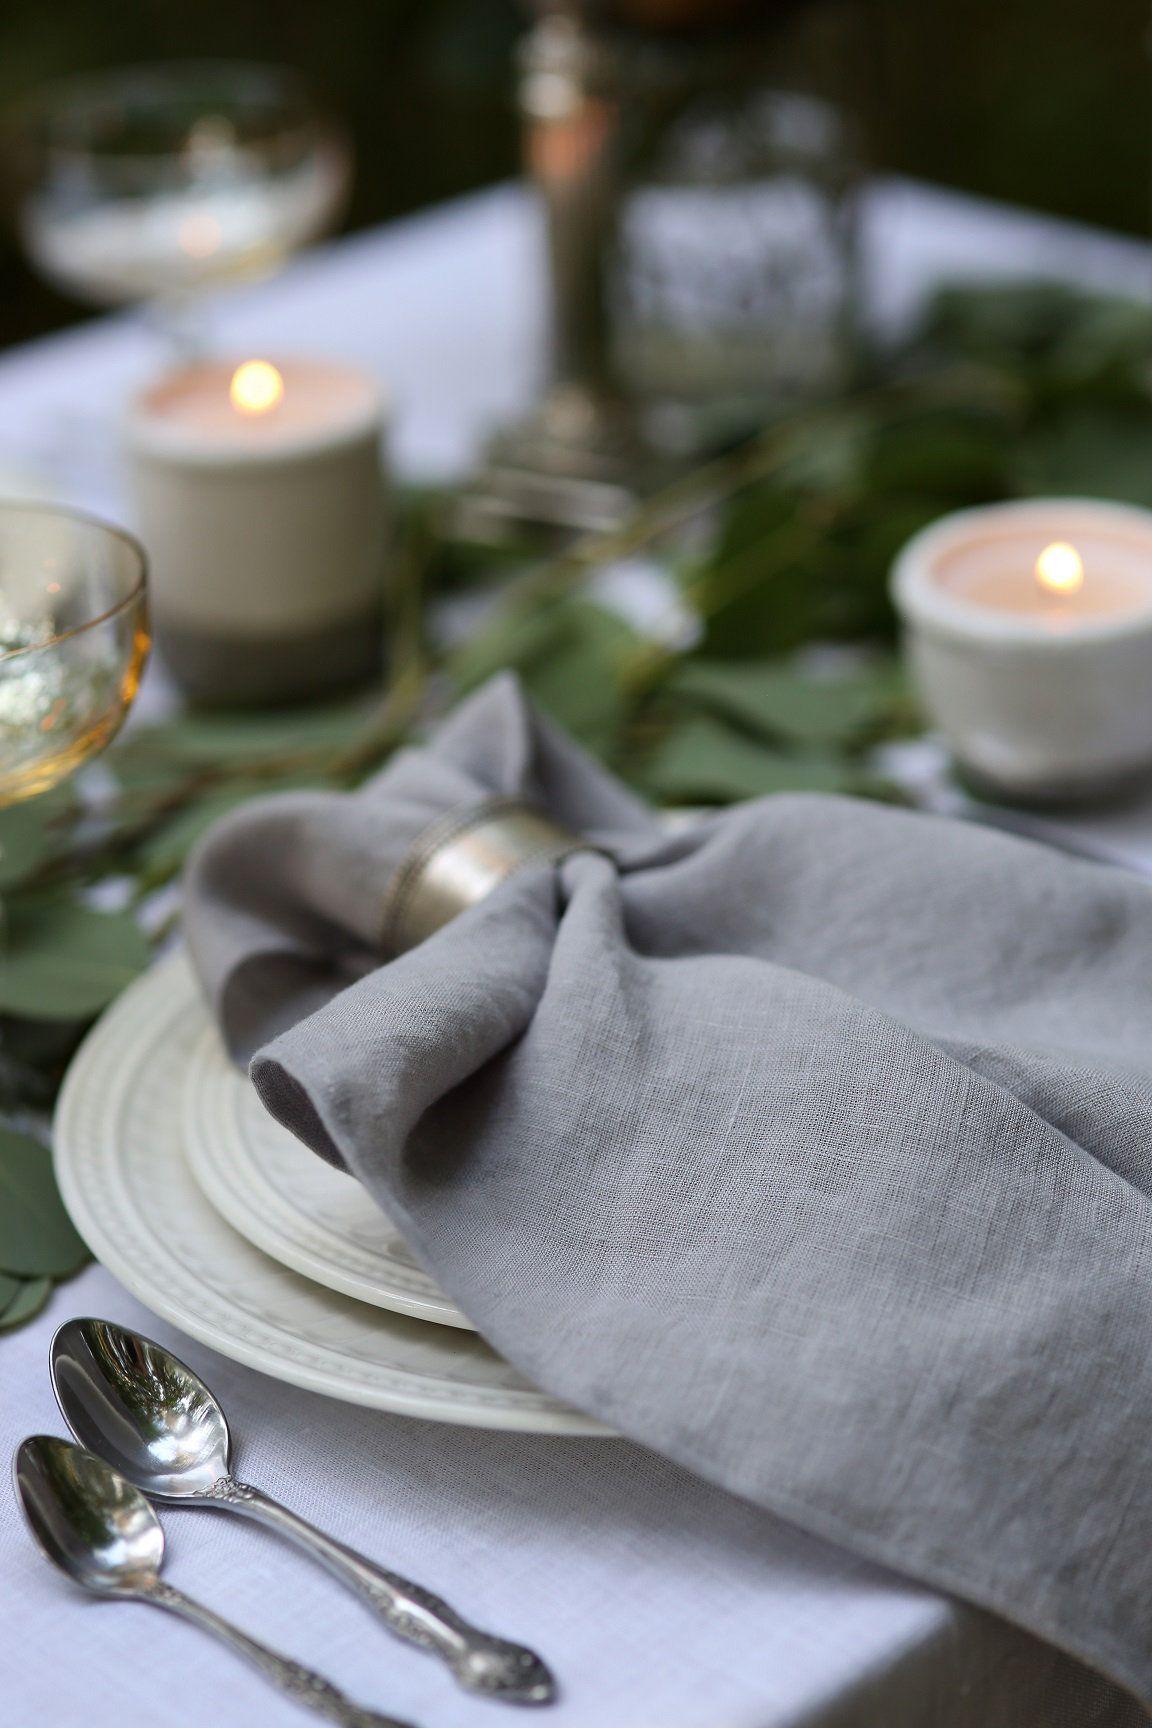 Light Grey Linen Napkin Set Grey Napkins Cloth Linen Napkins Blush Pink Napkin Handmade Napkins Table Linens Linen Napkins Napkins Set Gray Linen Napkins